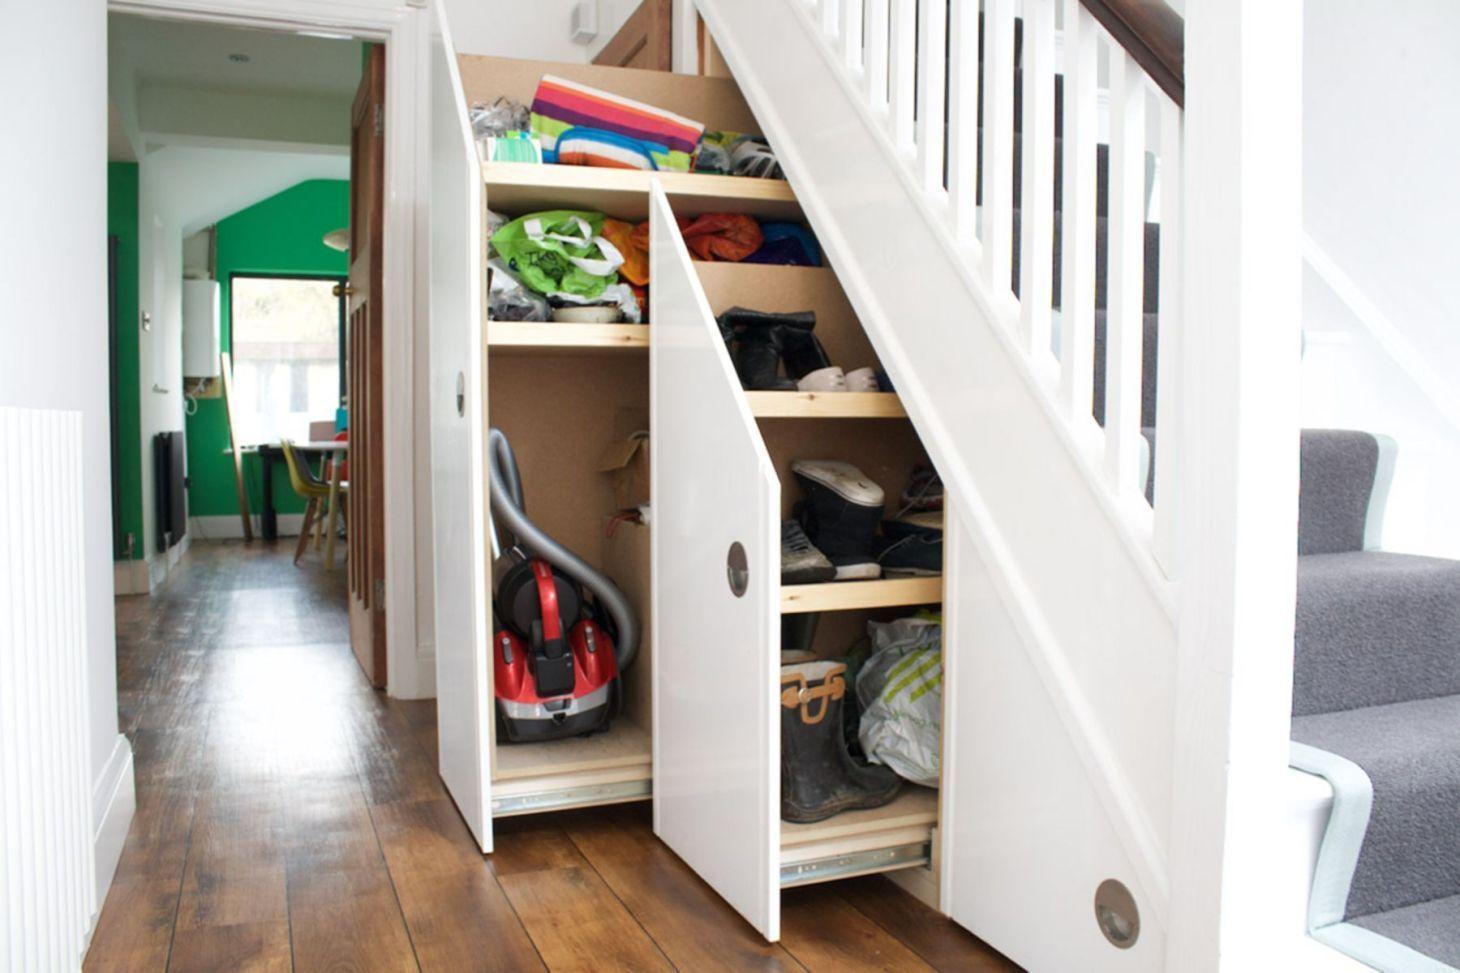 8 Most Creative Cupboard Design Ideas For Area Under